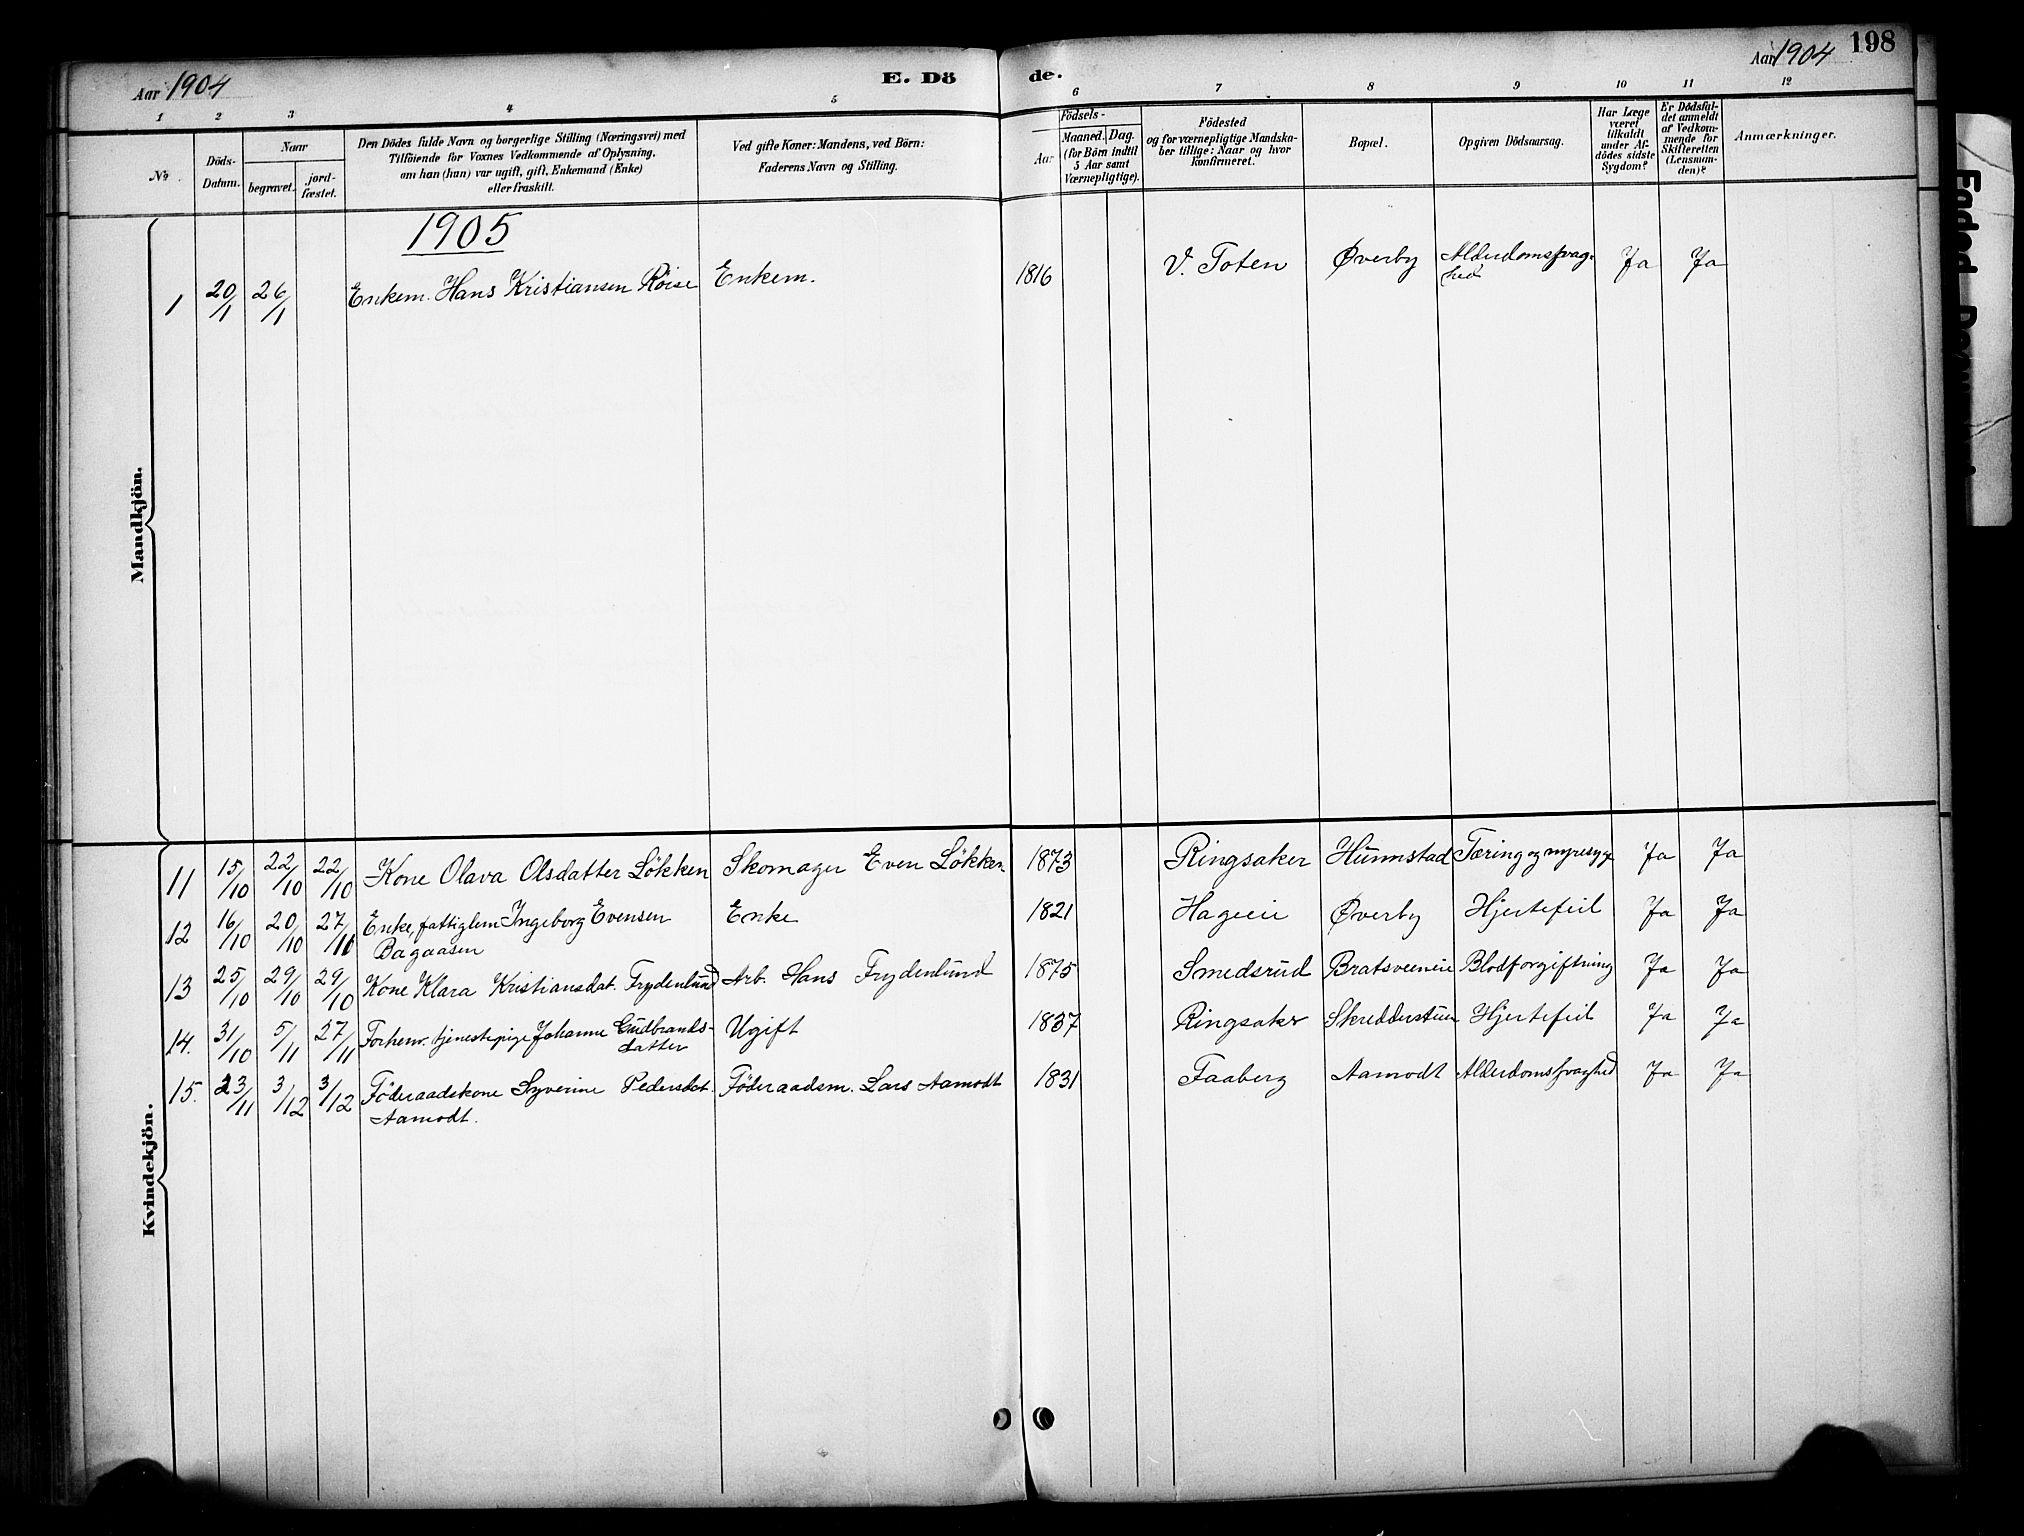 SAH, Vardal prestekontor, H/Ha/Haa/L0012: Ministerialbok nr. 12, 1893-1904, s. 198